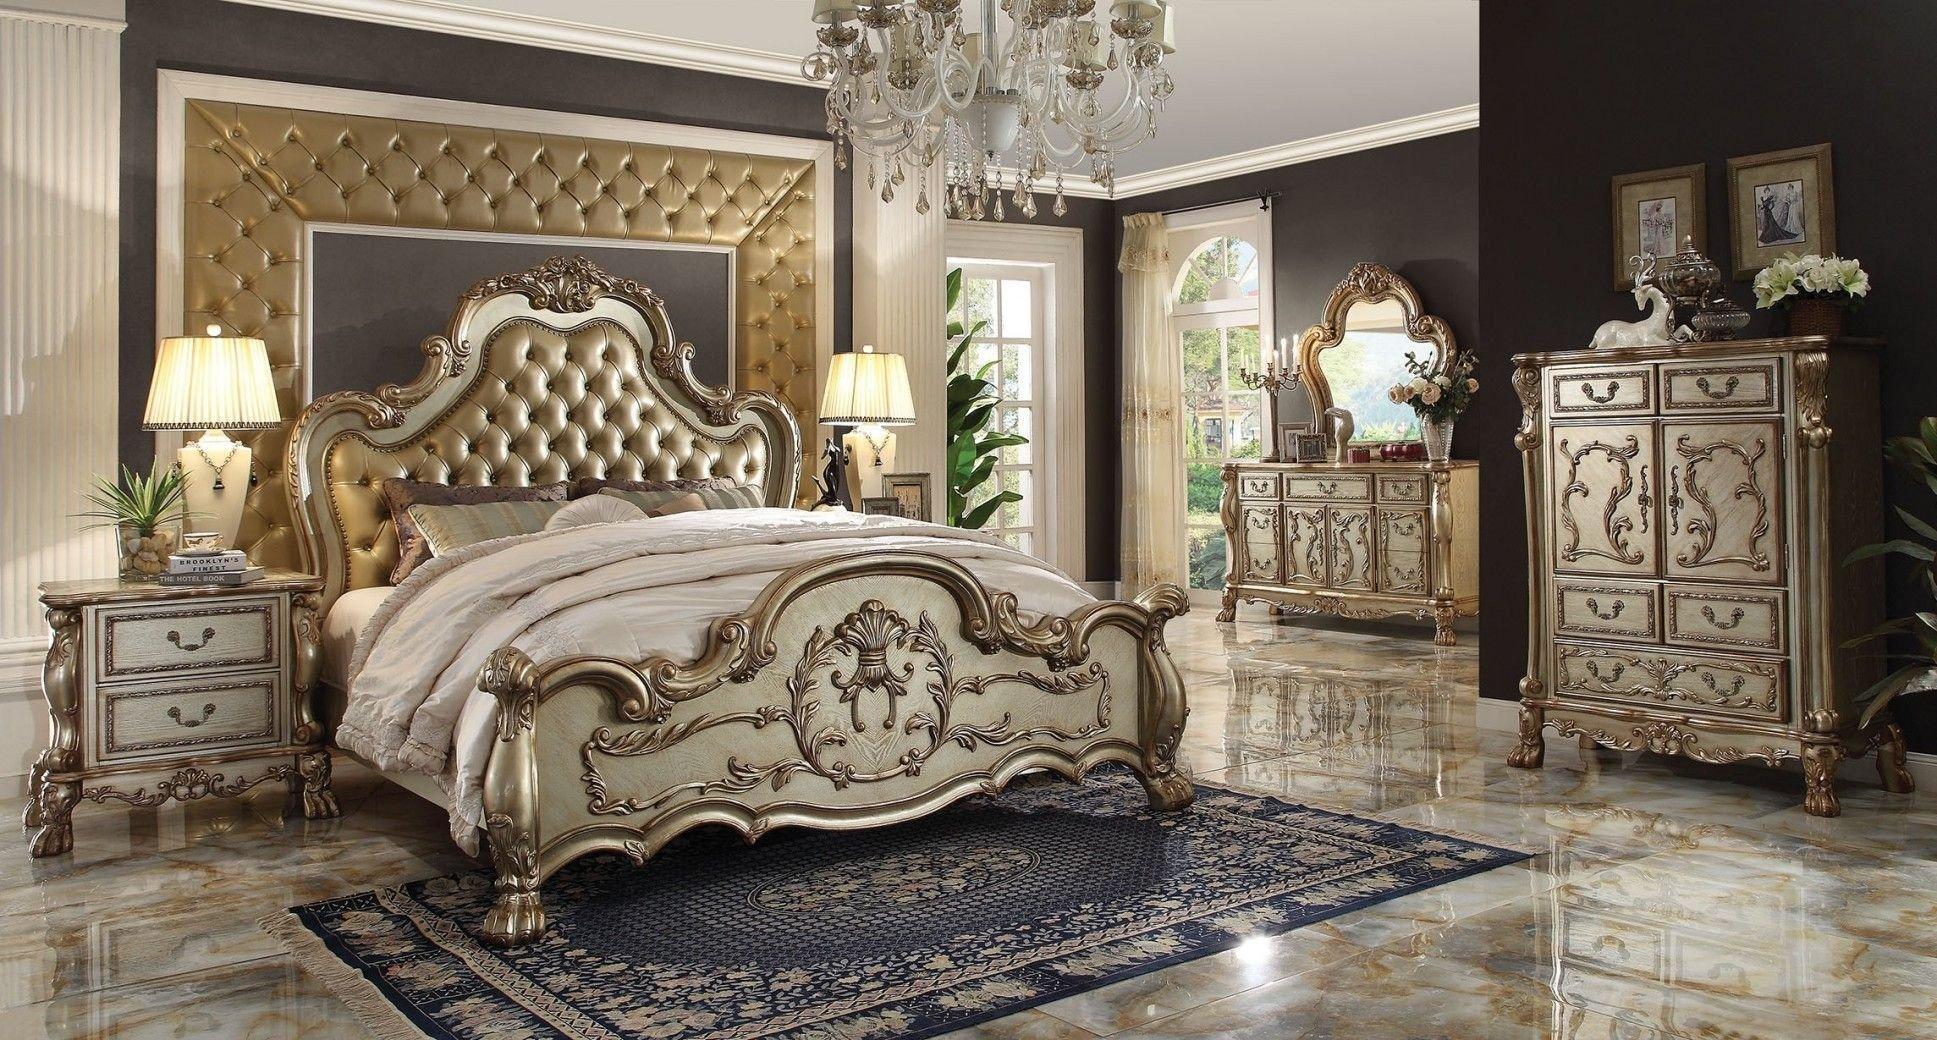 Acme Furniture Bedroom Set Best Of Acme Dresden Wood Pu Tufted Panel Bedroom Set